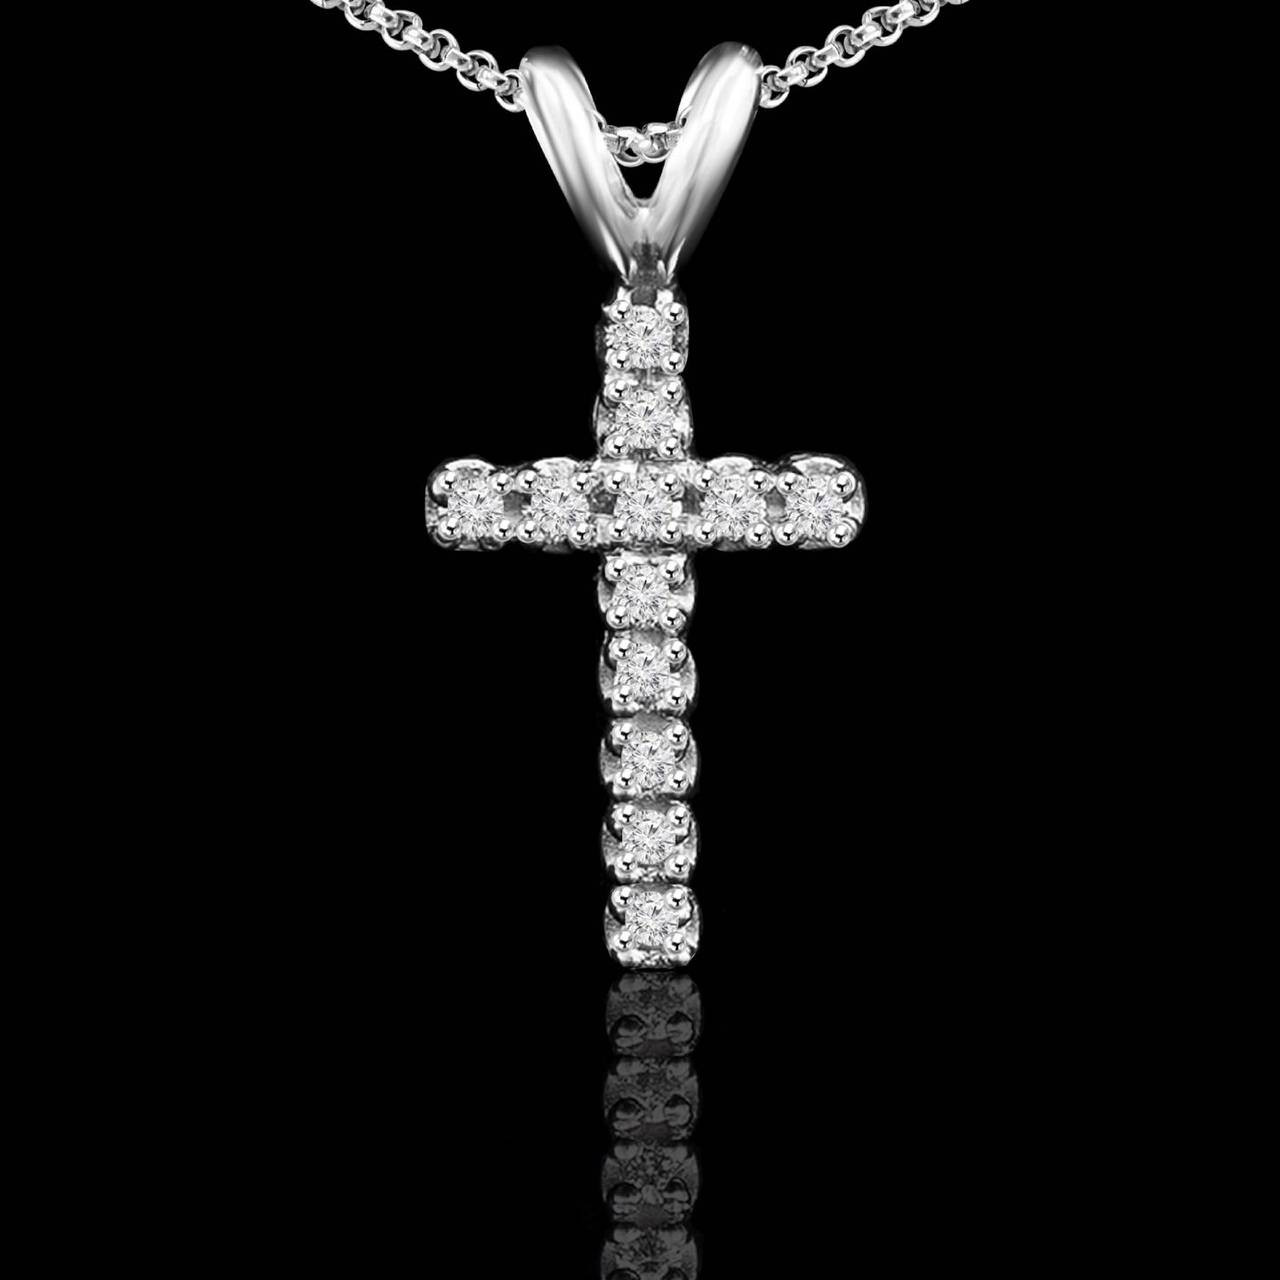 Diamond cross pendant bijoux majesty cross 110 ctw pave diamond cross pendant necklace in 14k white gold with aloadofball Gallery